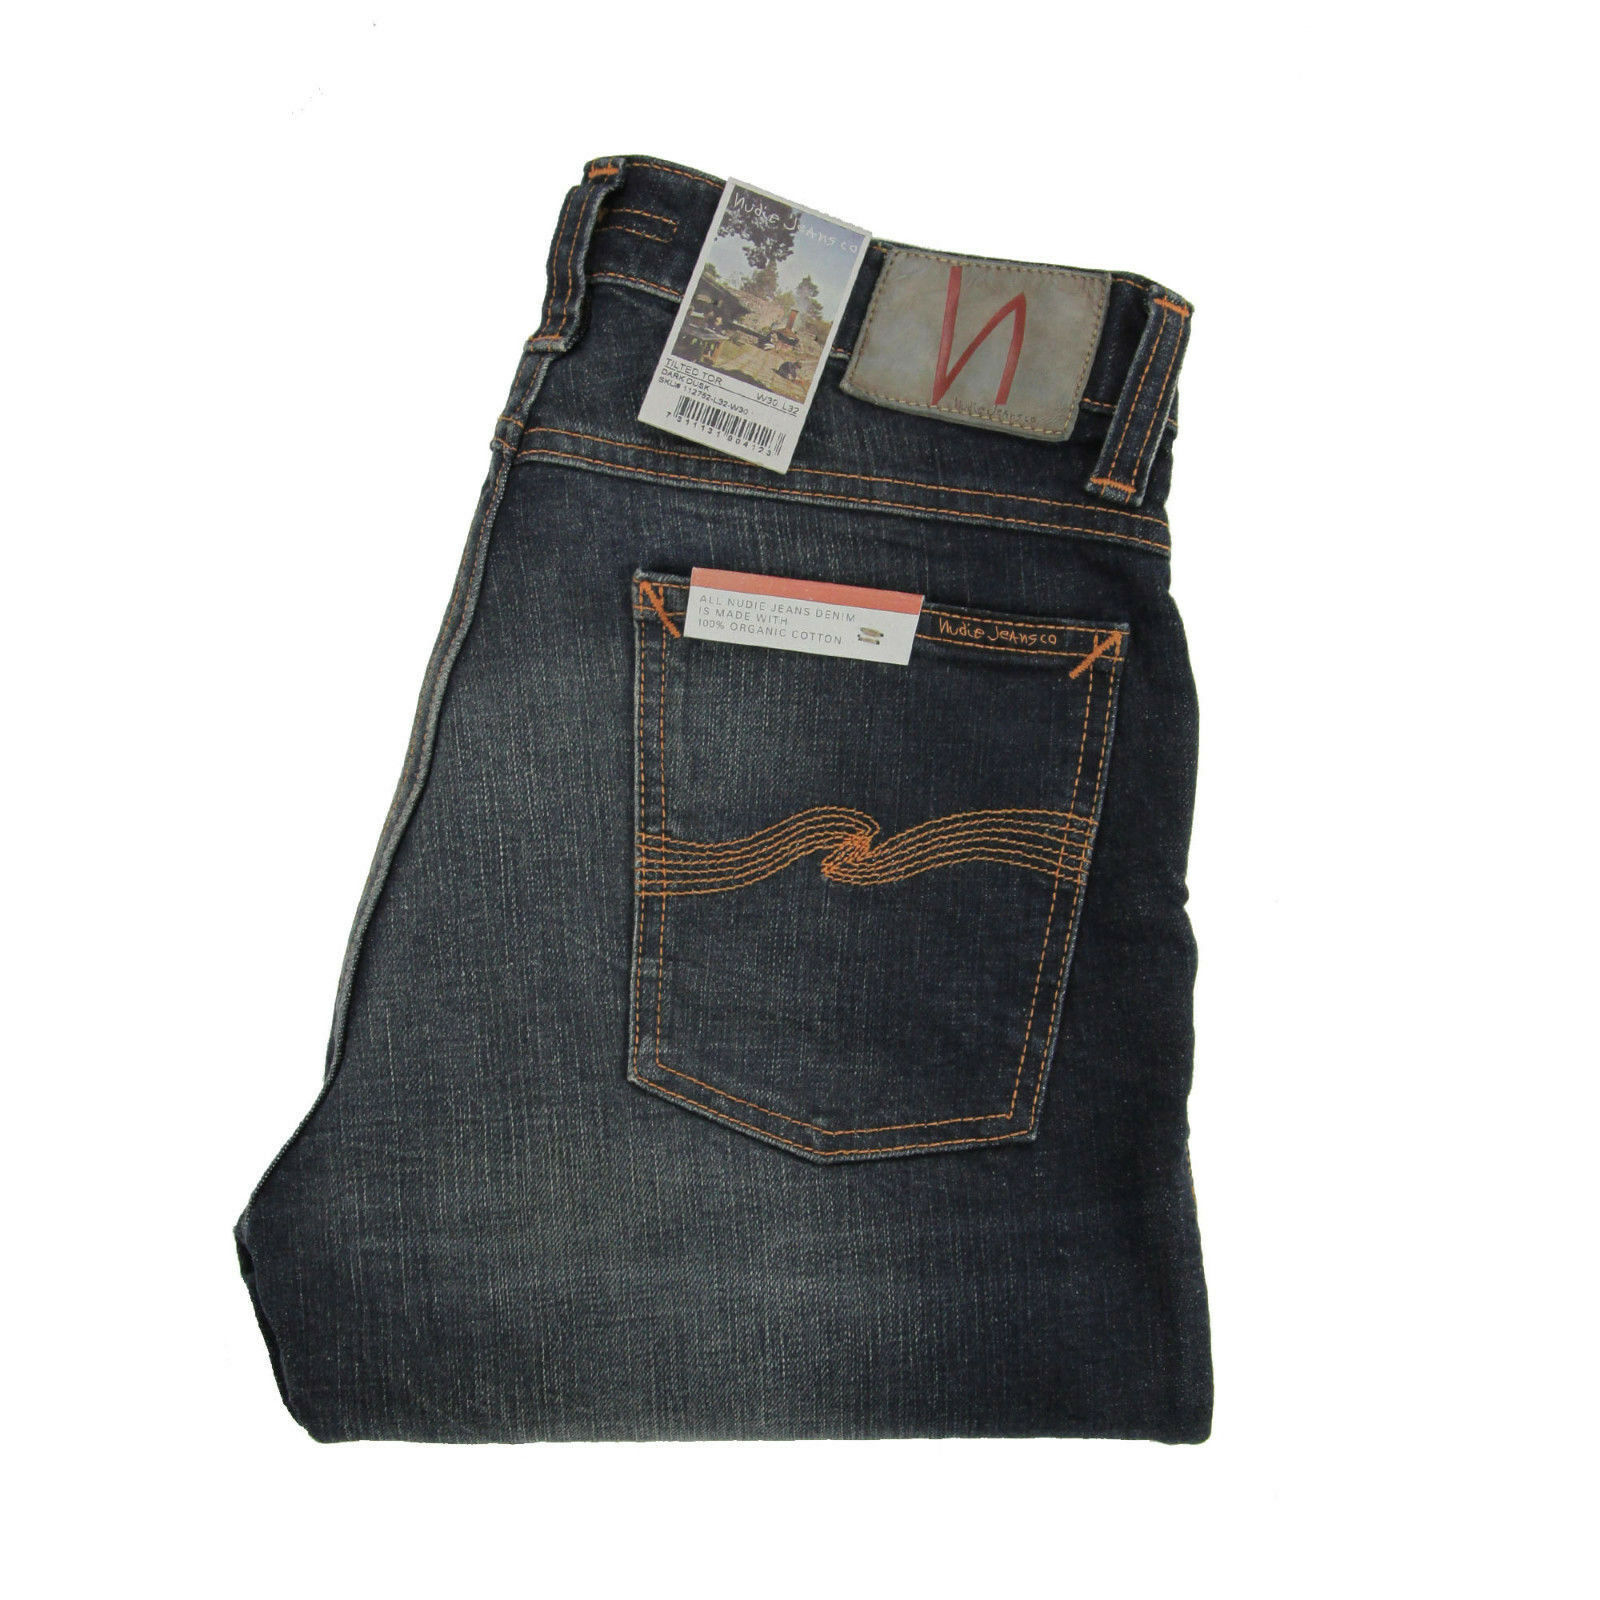 Nudie, Tilted Tor, Jeans, Dark Dusk, bluee Washed, 112752, Slim Fit, New